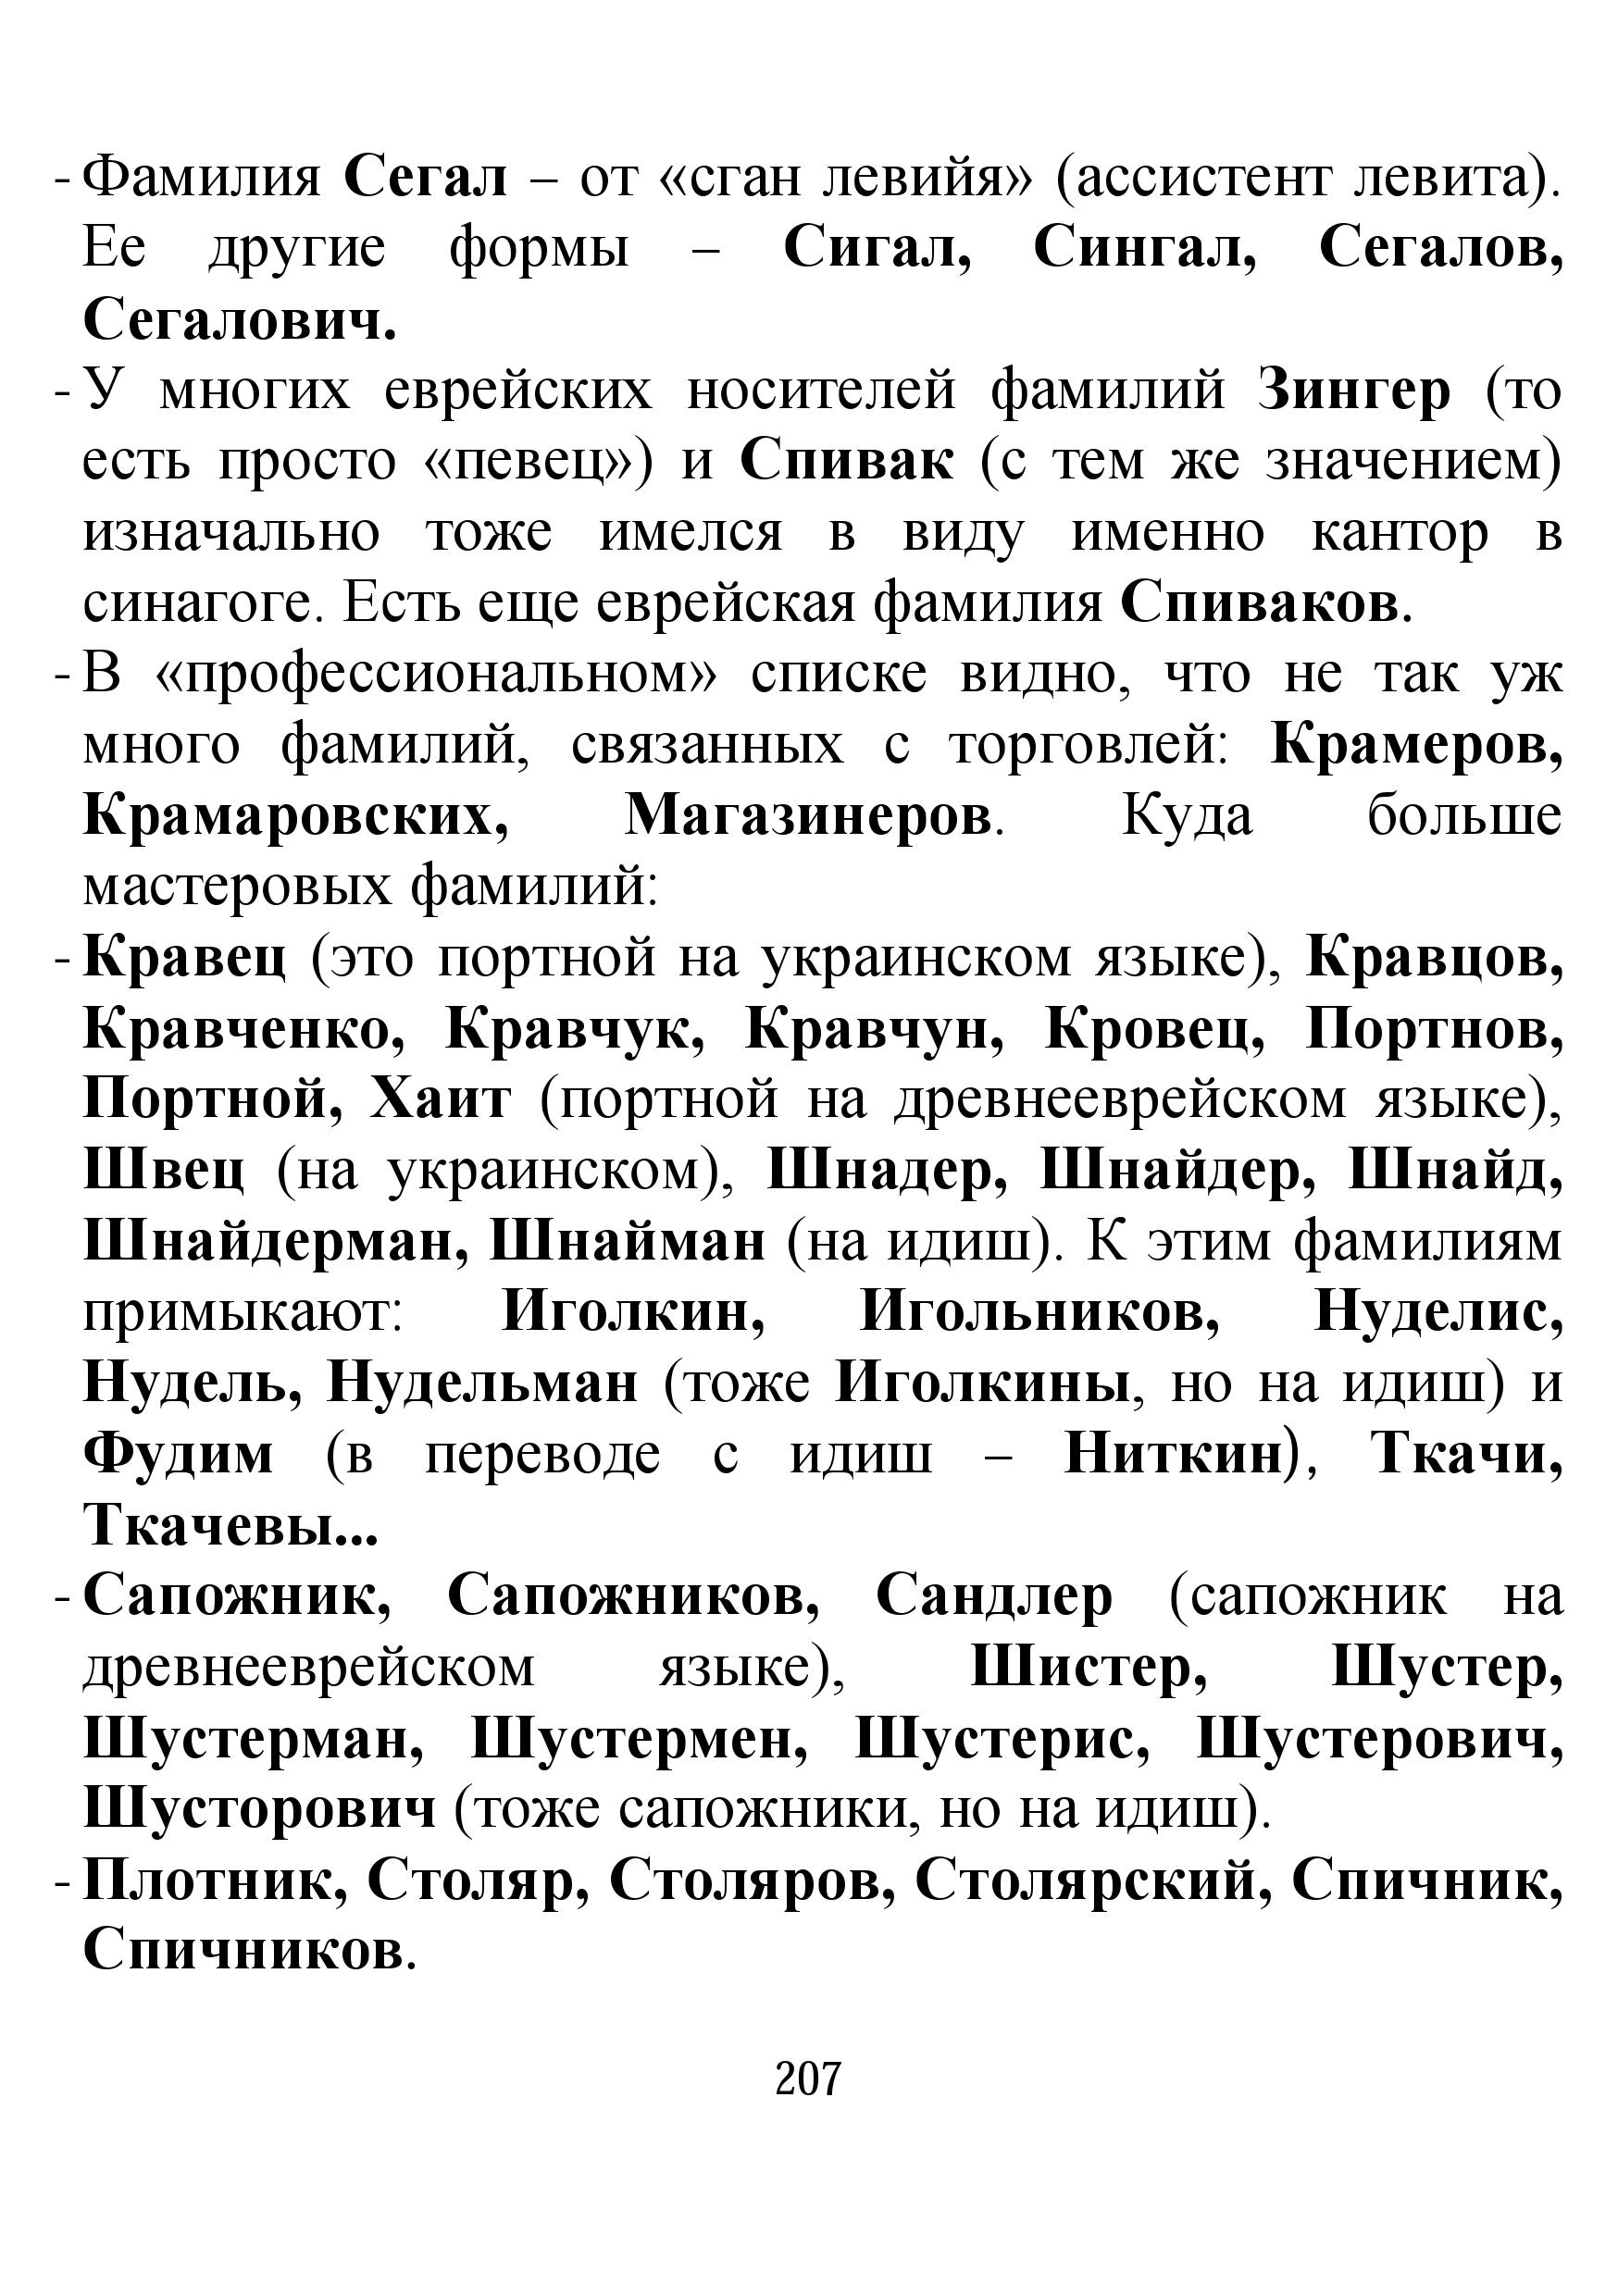 http://se.uploads.ru/weOiU.jpg